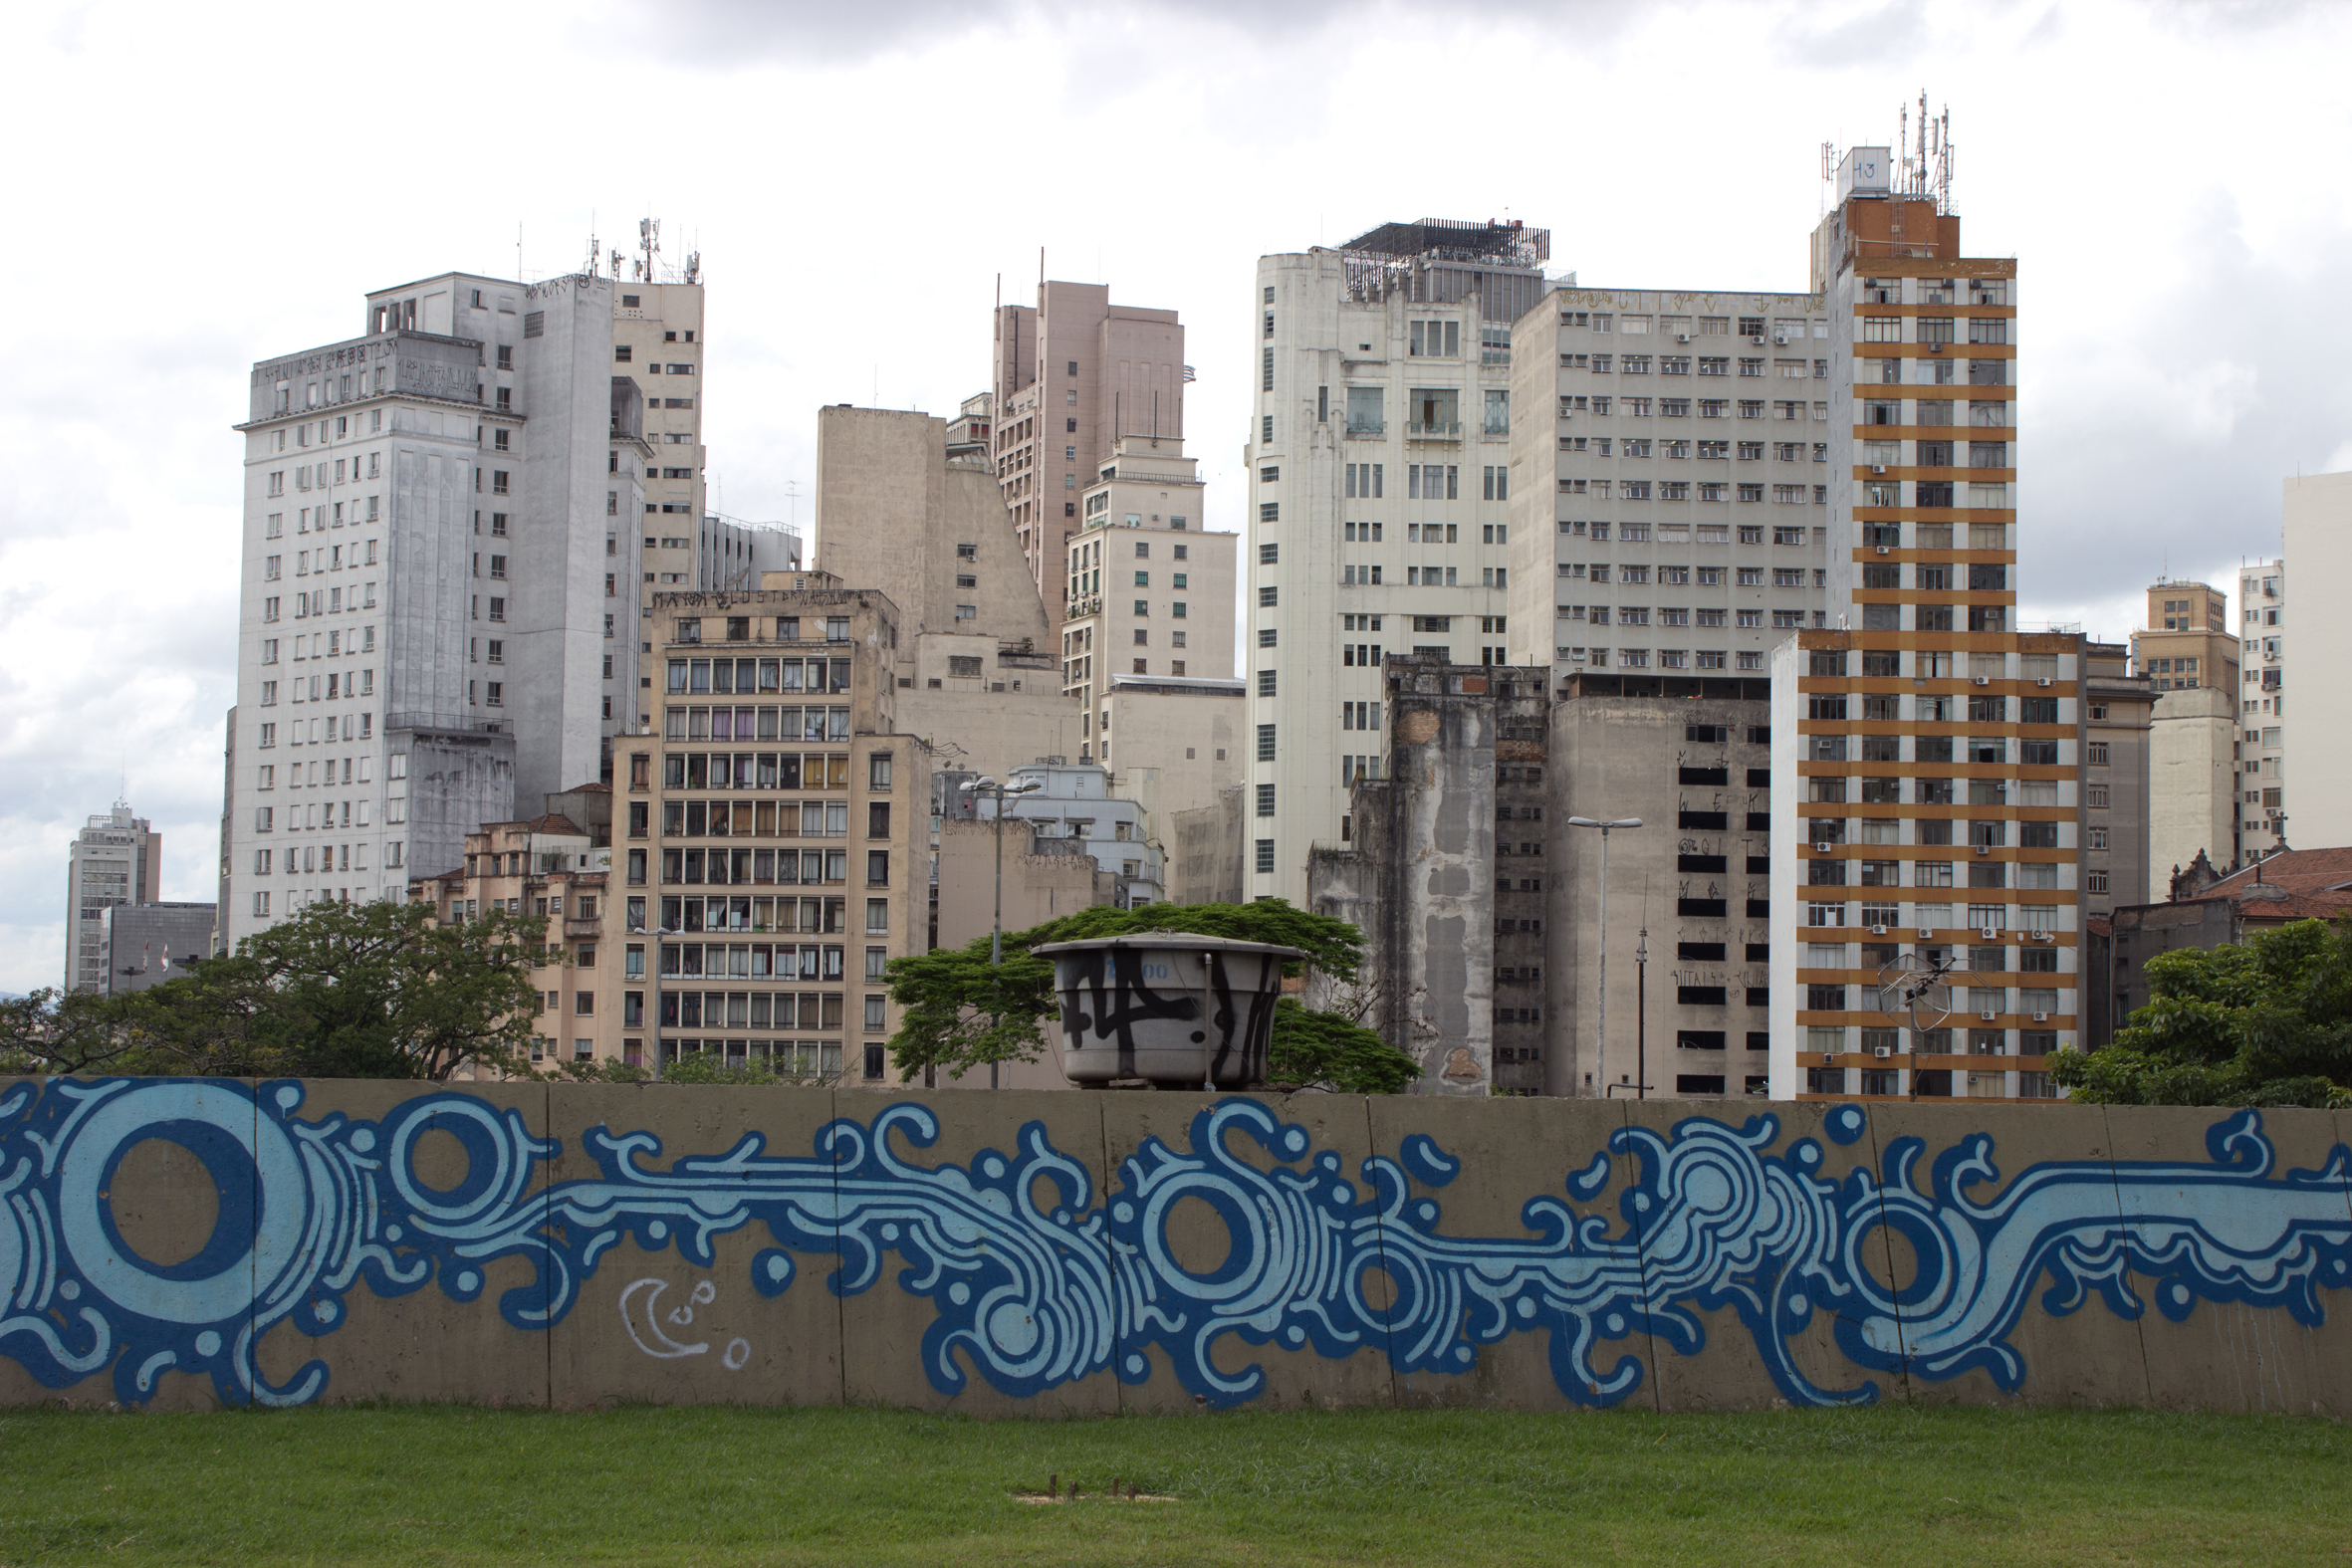 Schirn_Presse_Zezao_Sao_Paulo_2012